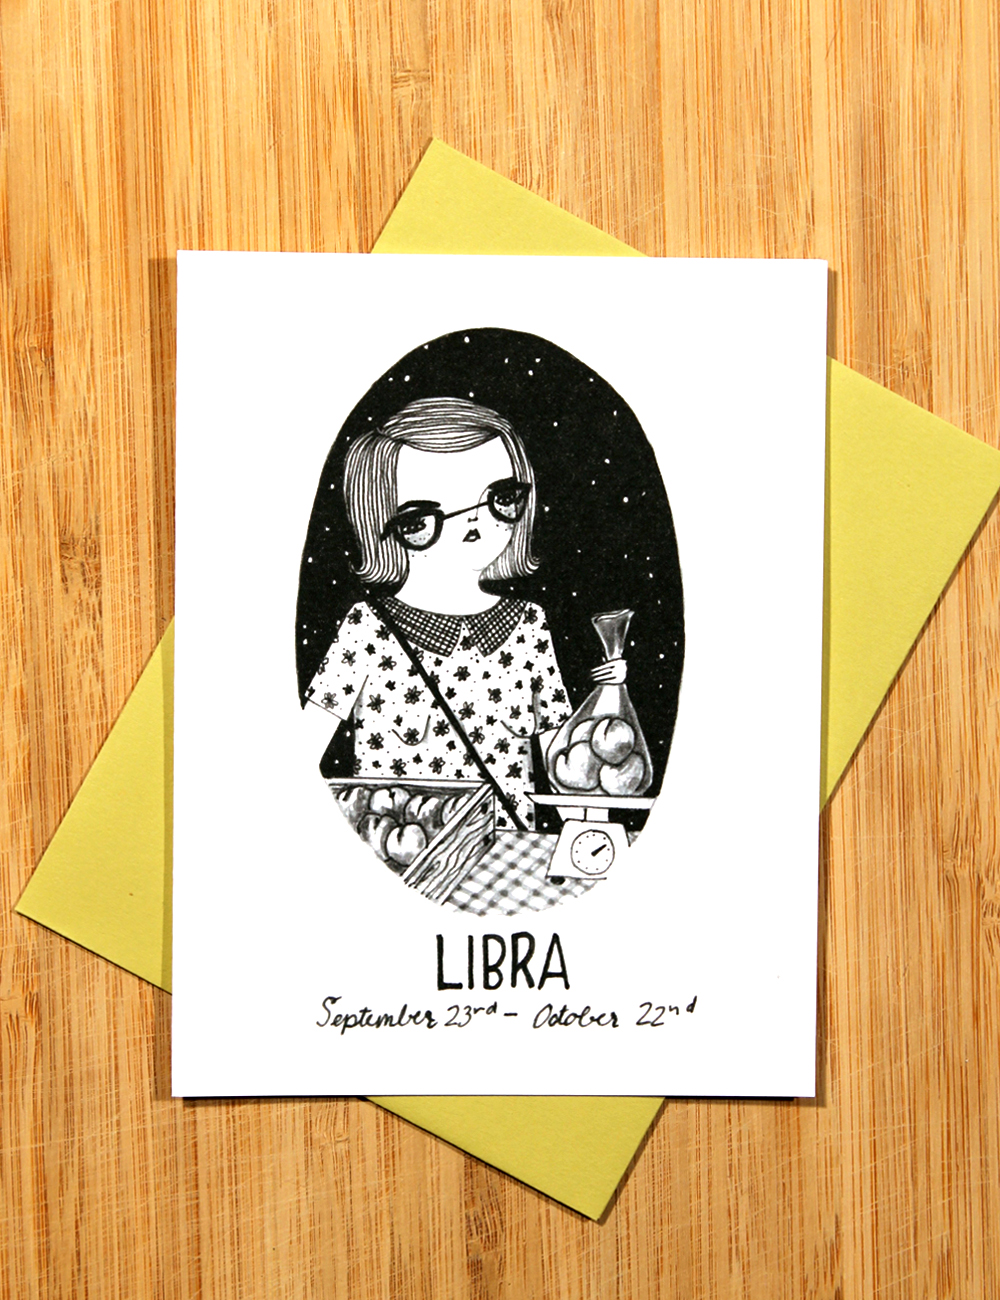 Libracard.jpg